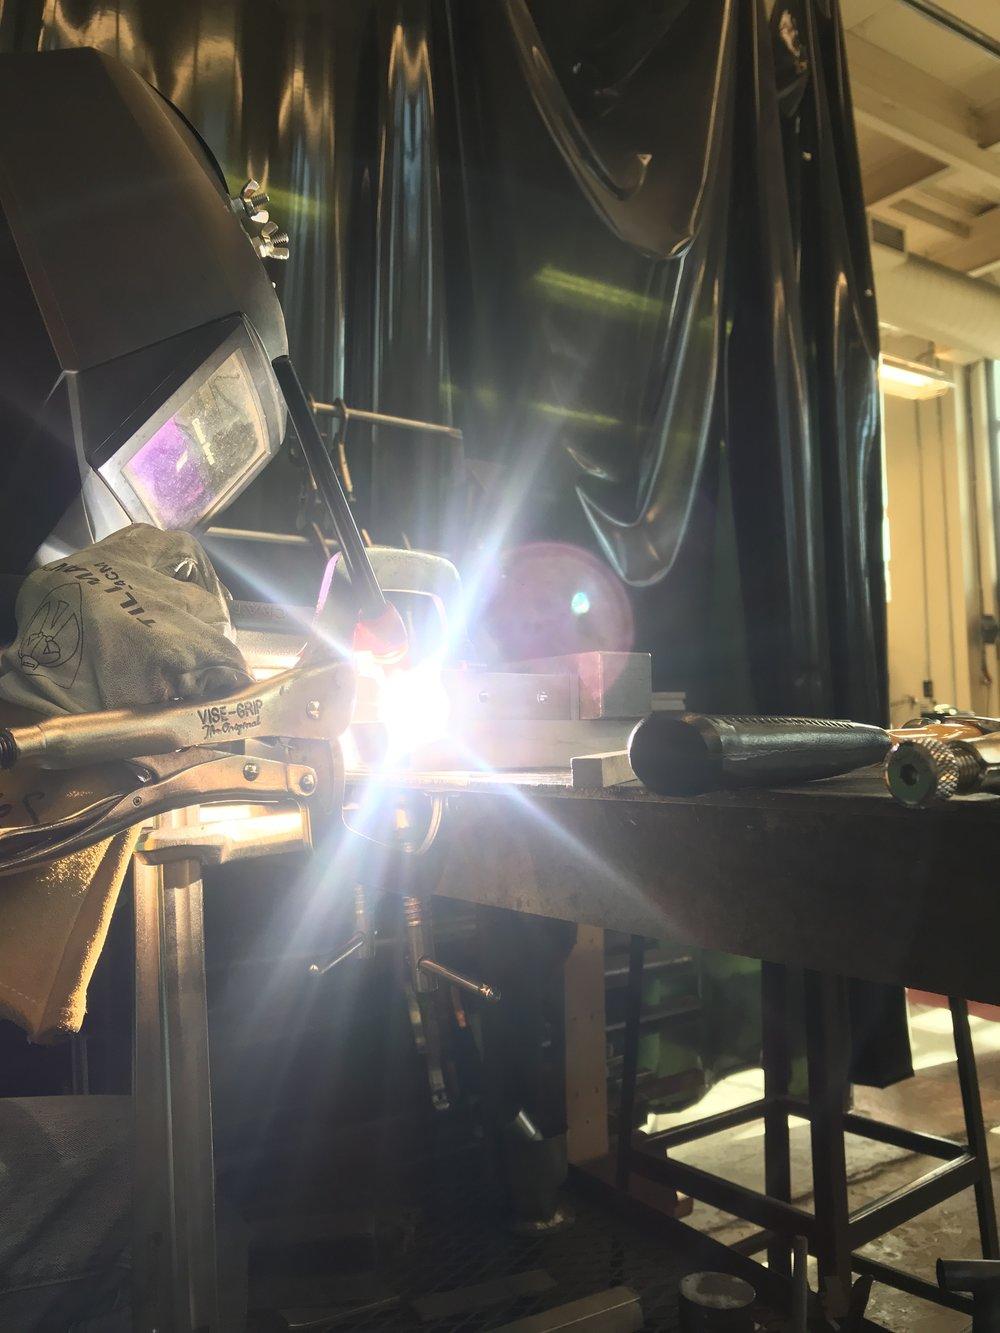 TIG welding a segment of the aluminum frame